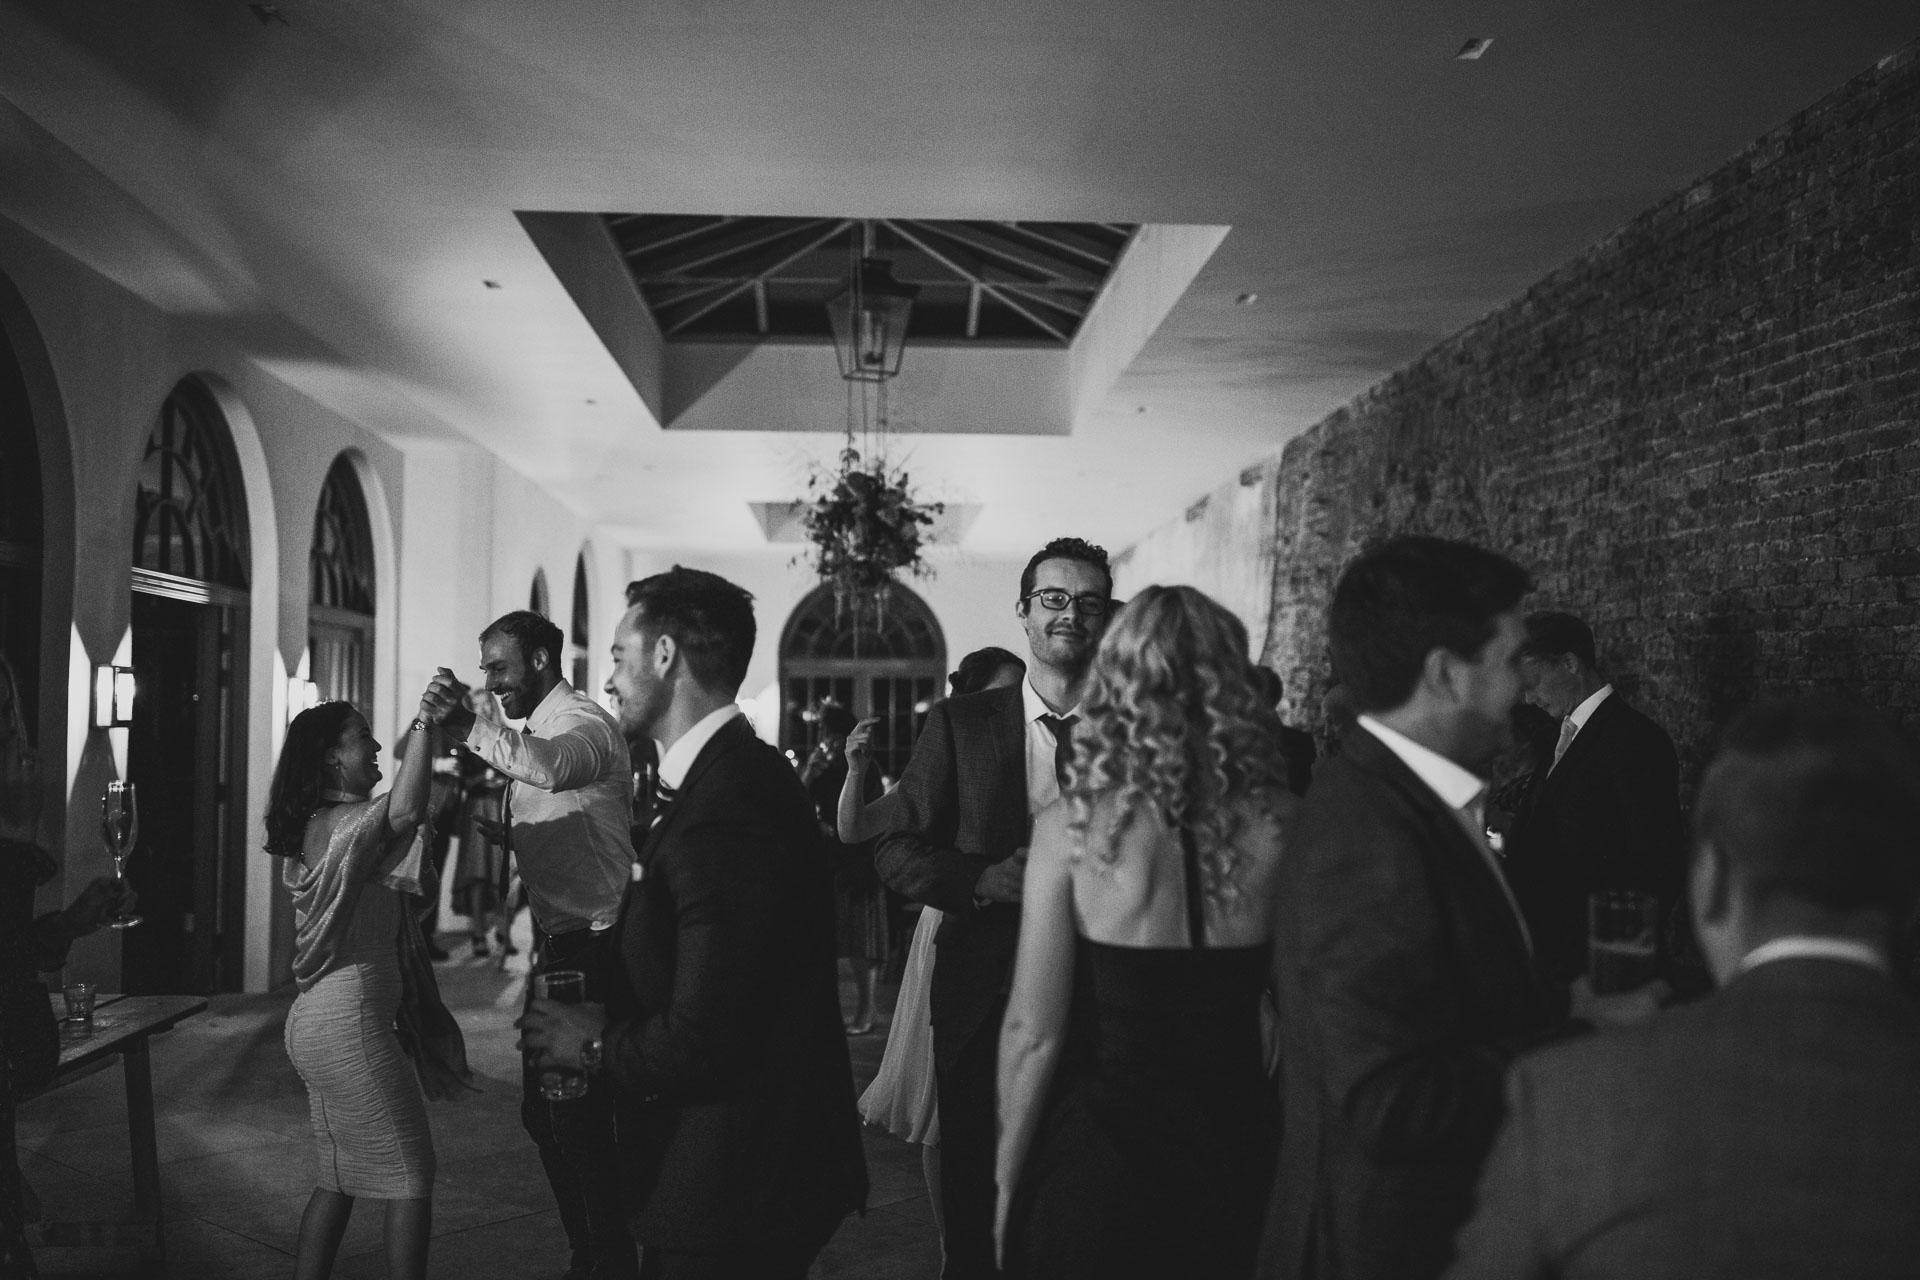 middleton_lodge_wedding_photographer-114.jpg